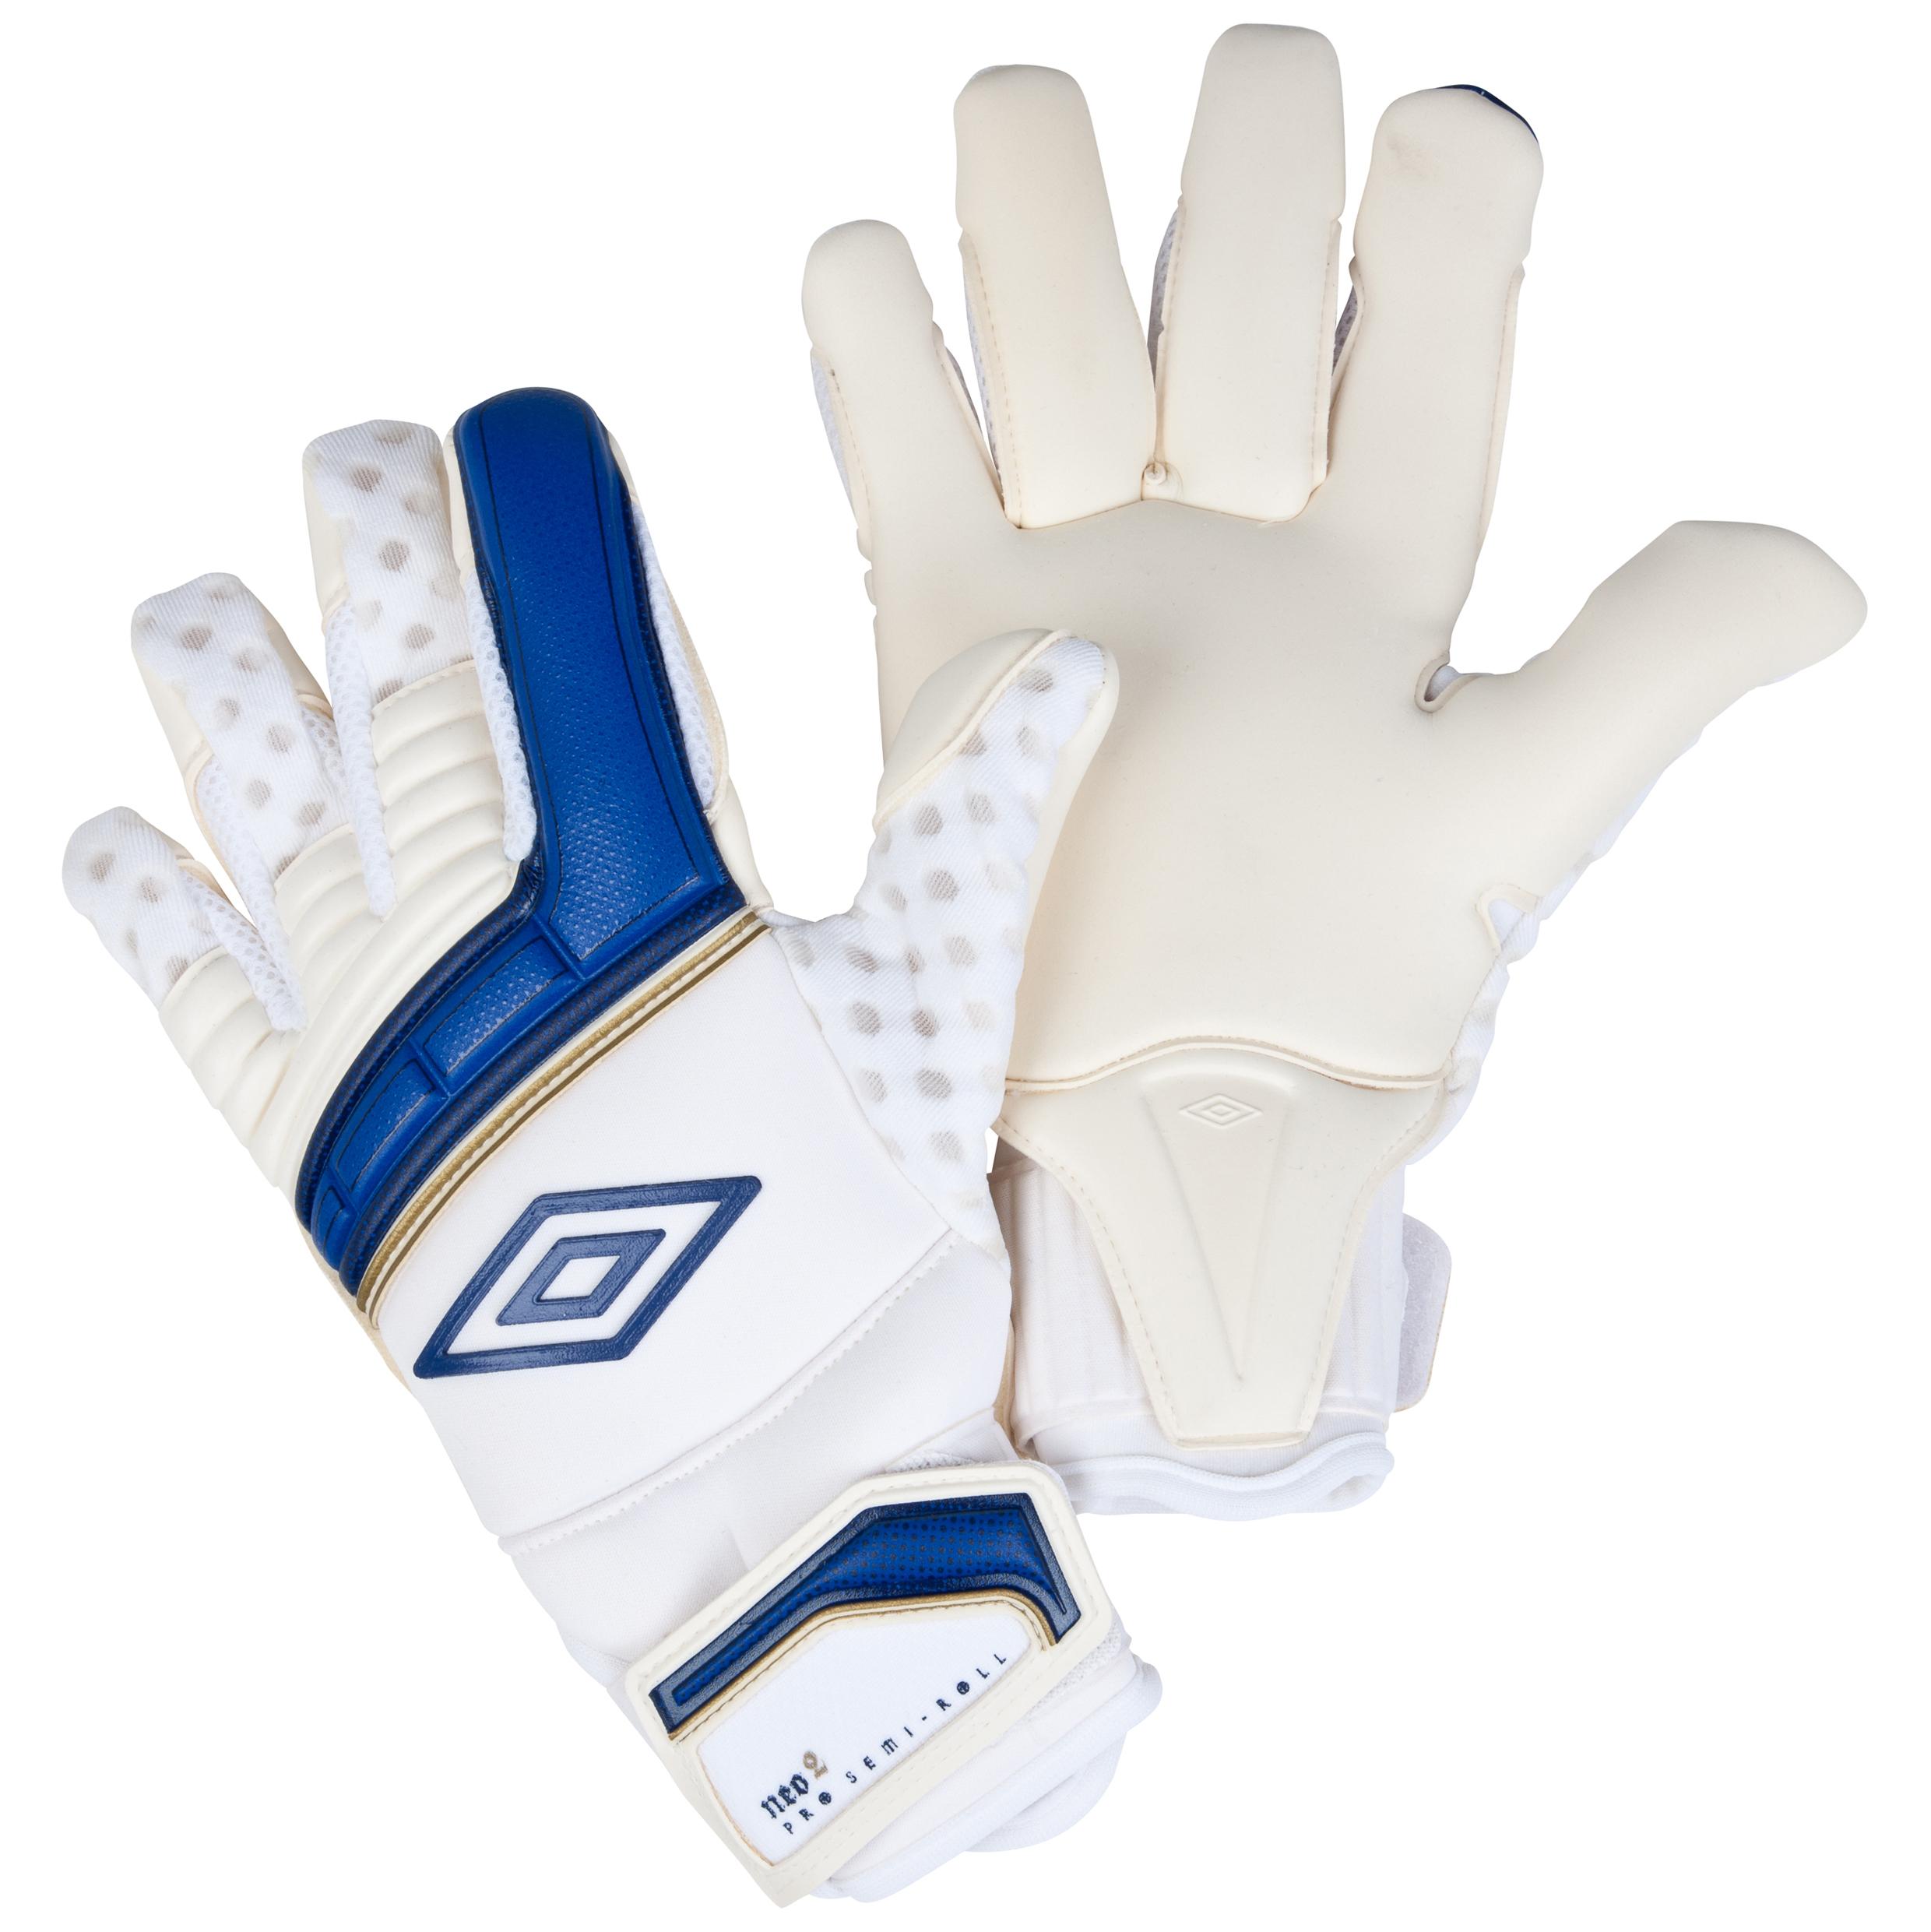 Umbro Neo Pro Goalkeeper Gloves-White / Twilight Blue / Gold